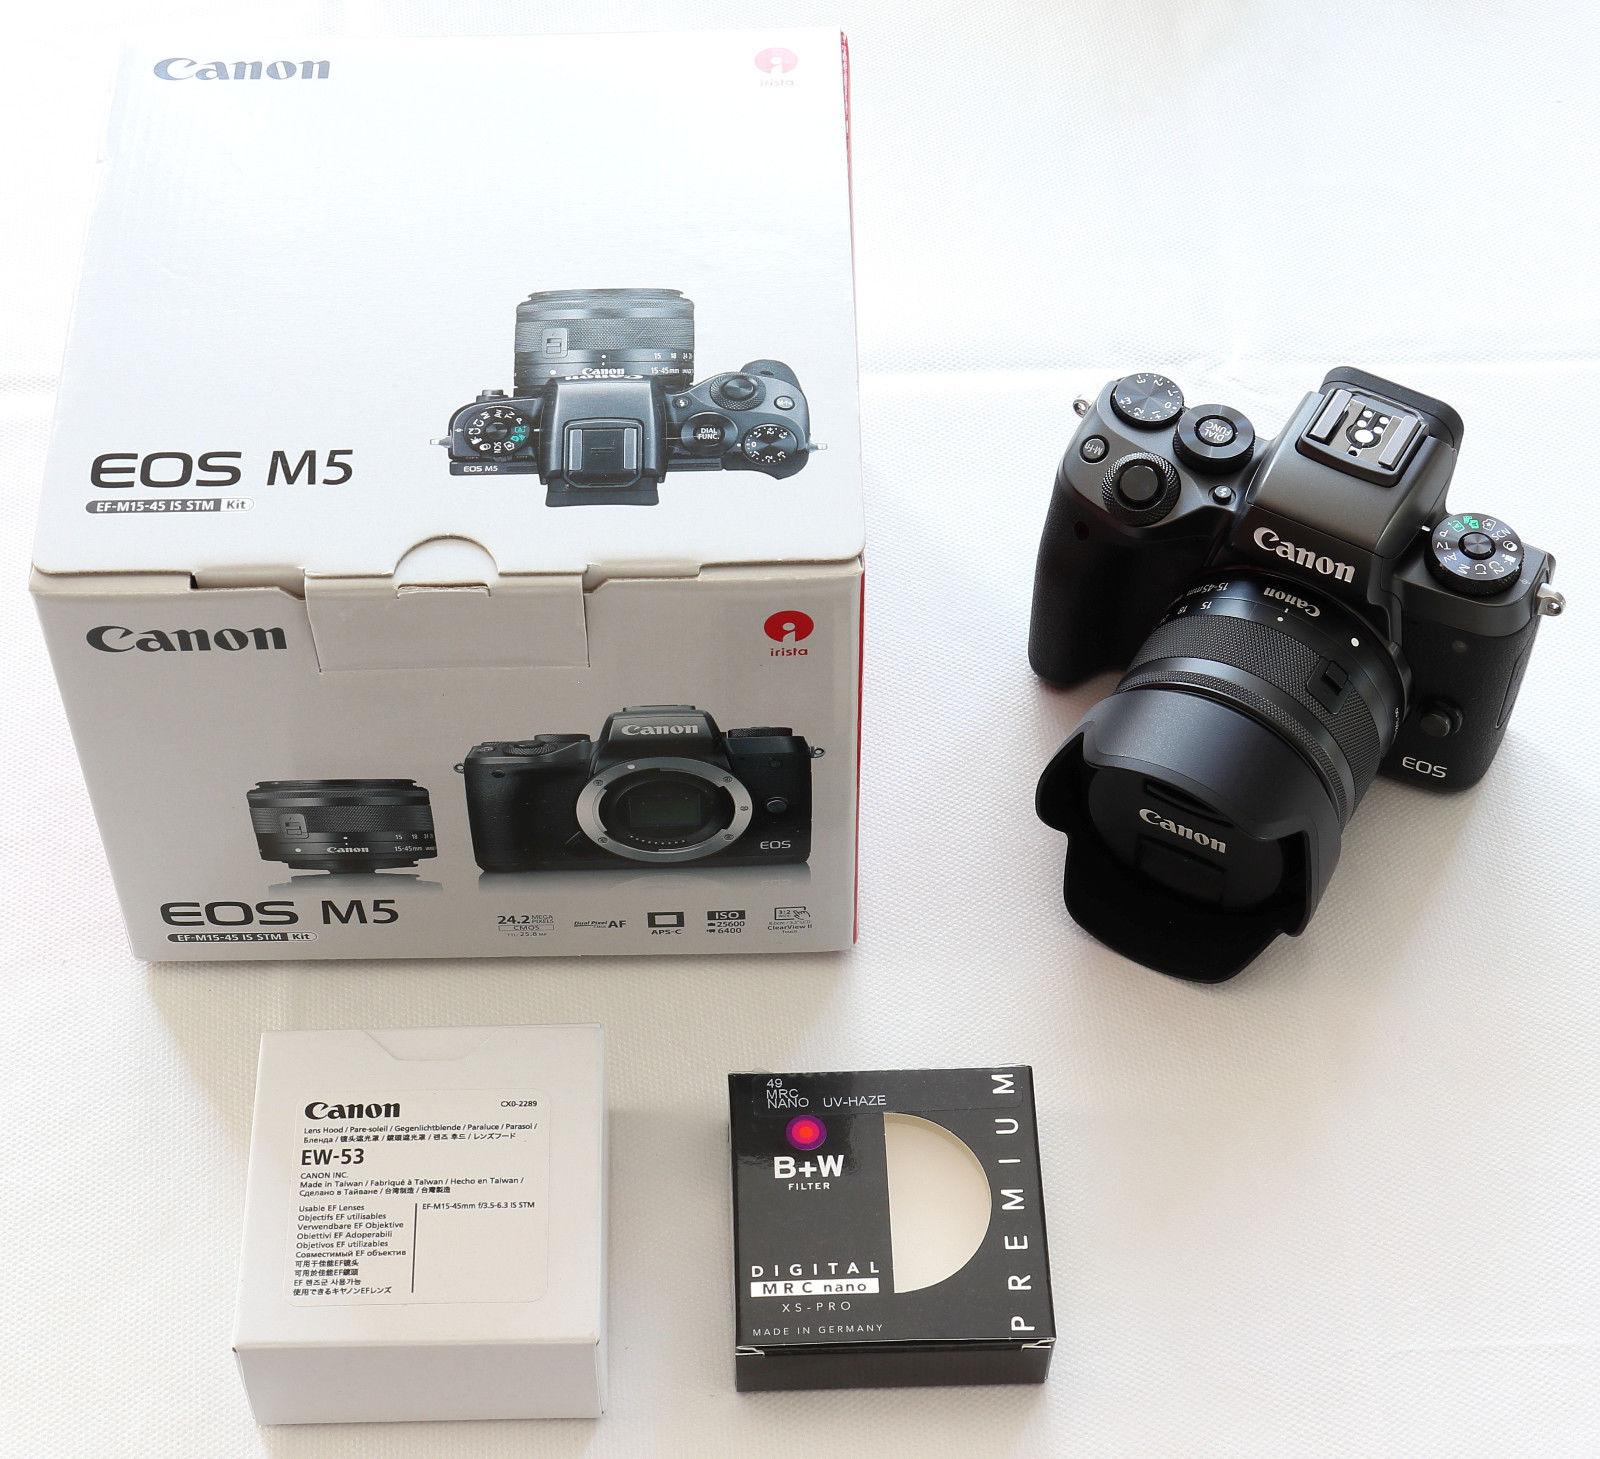 Canon EOS M5 inkl. EF-M 15-45mm 1:3,5-6,3 IS STM Objektiv (+Restgarantie)